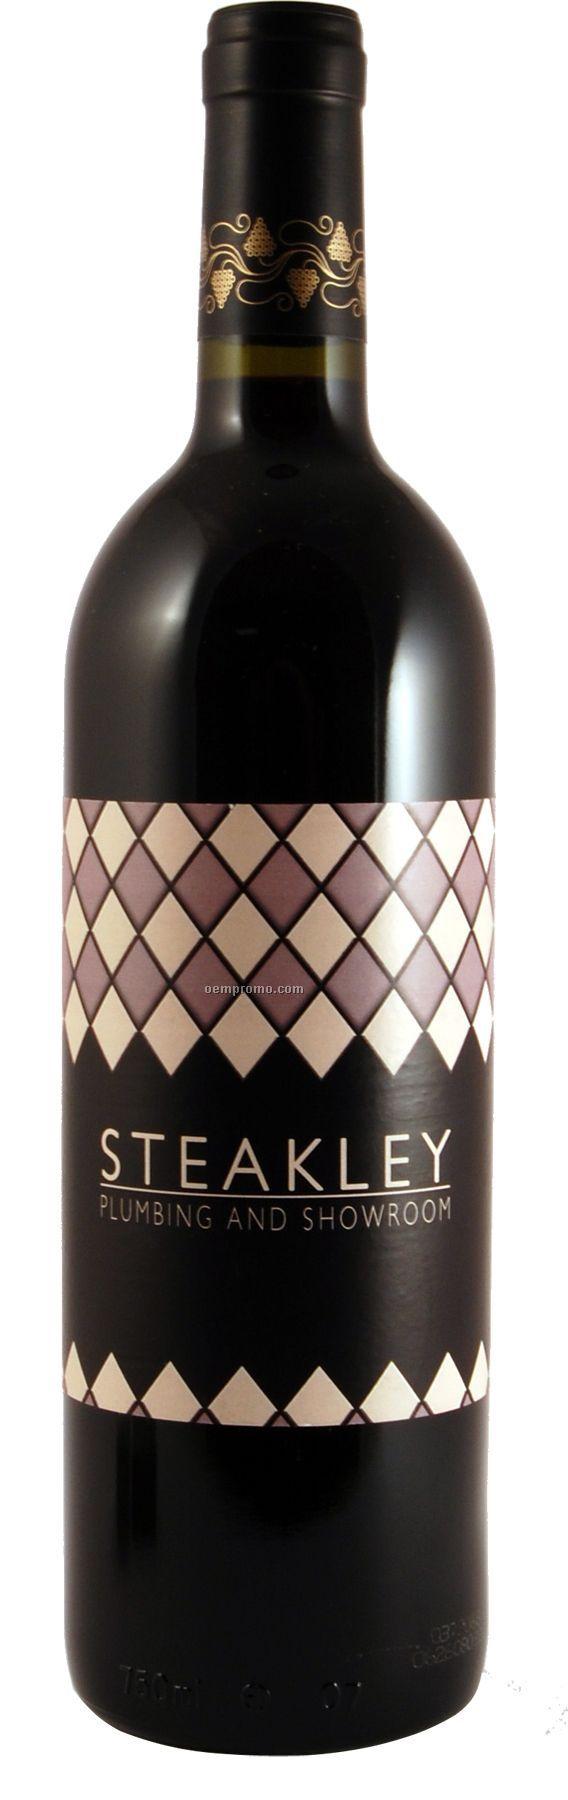 2007 Wv Three Vines Red, California Wine (Custom Labeled Wine)